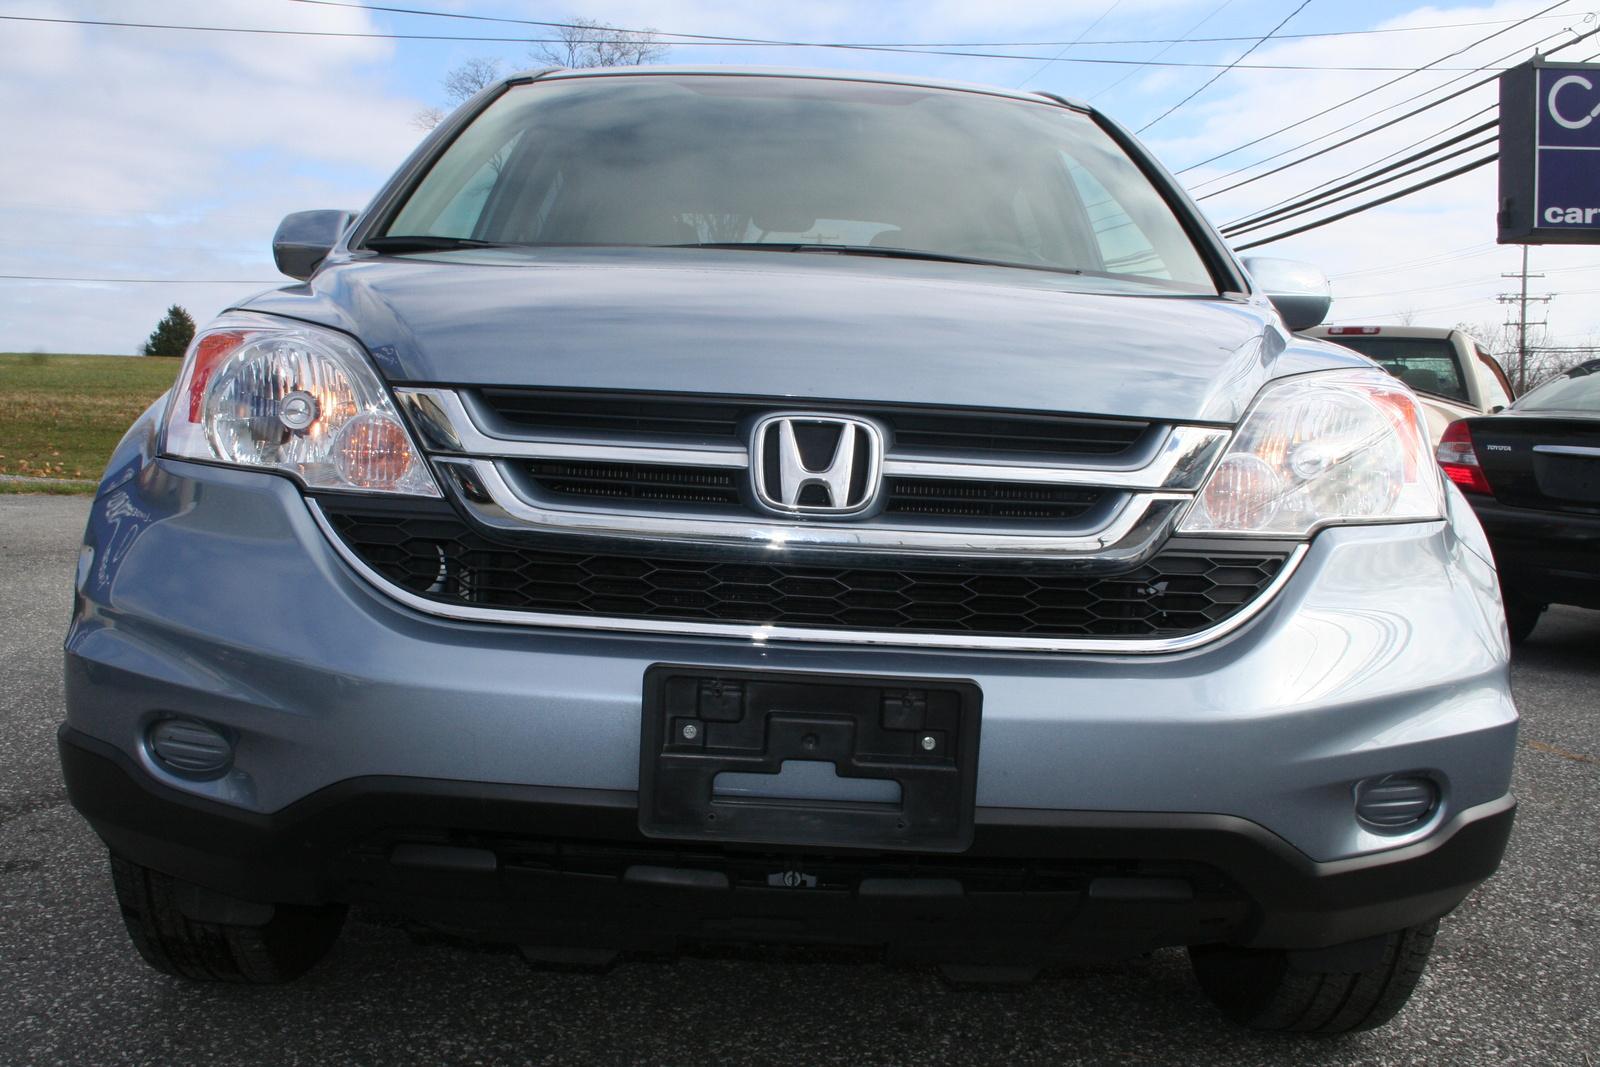 2011 honda cr v pictures cargurus for Honda hrv cargurus